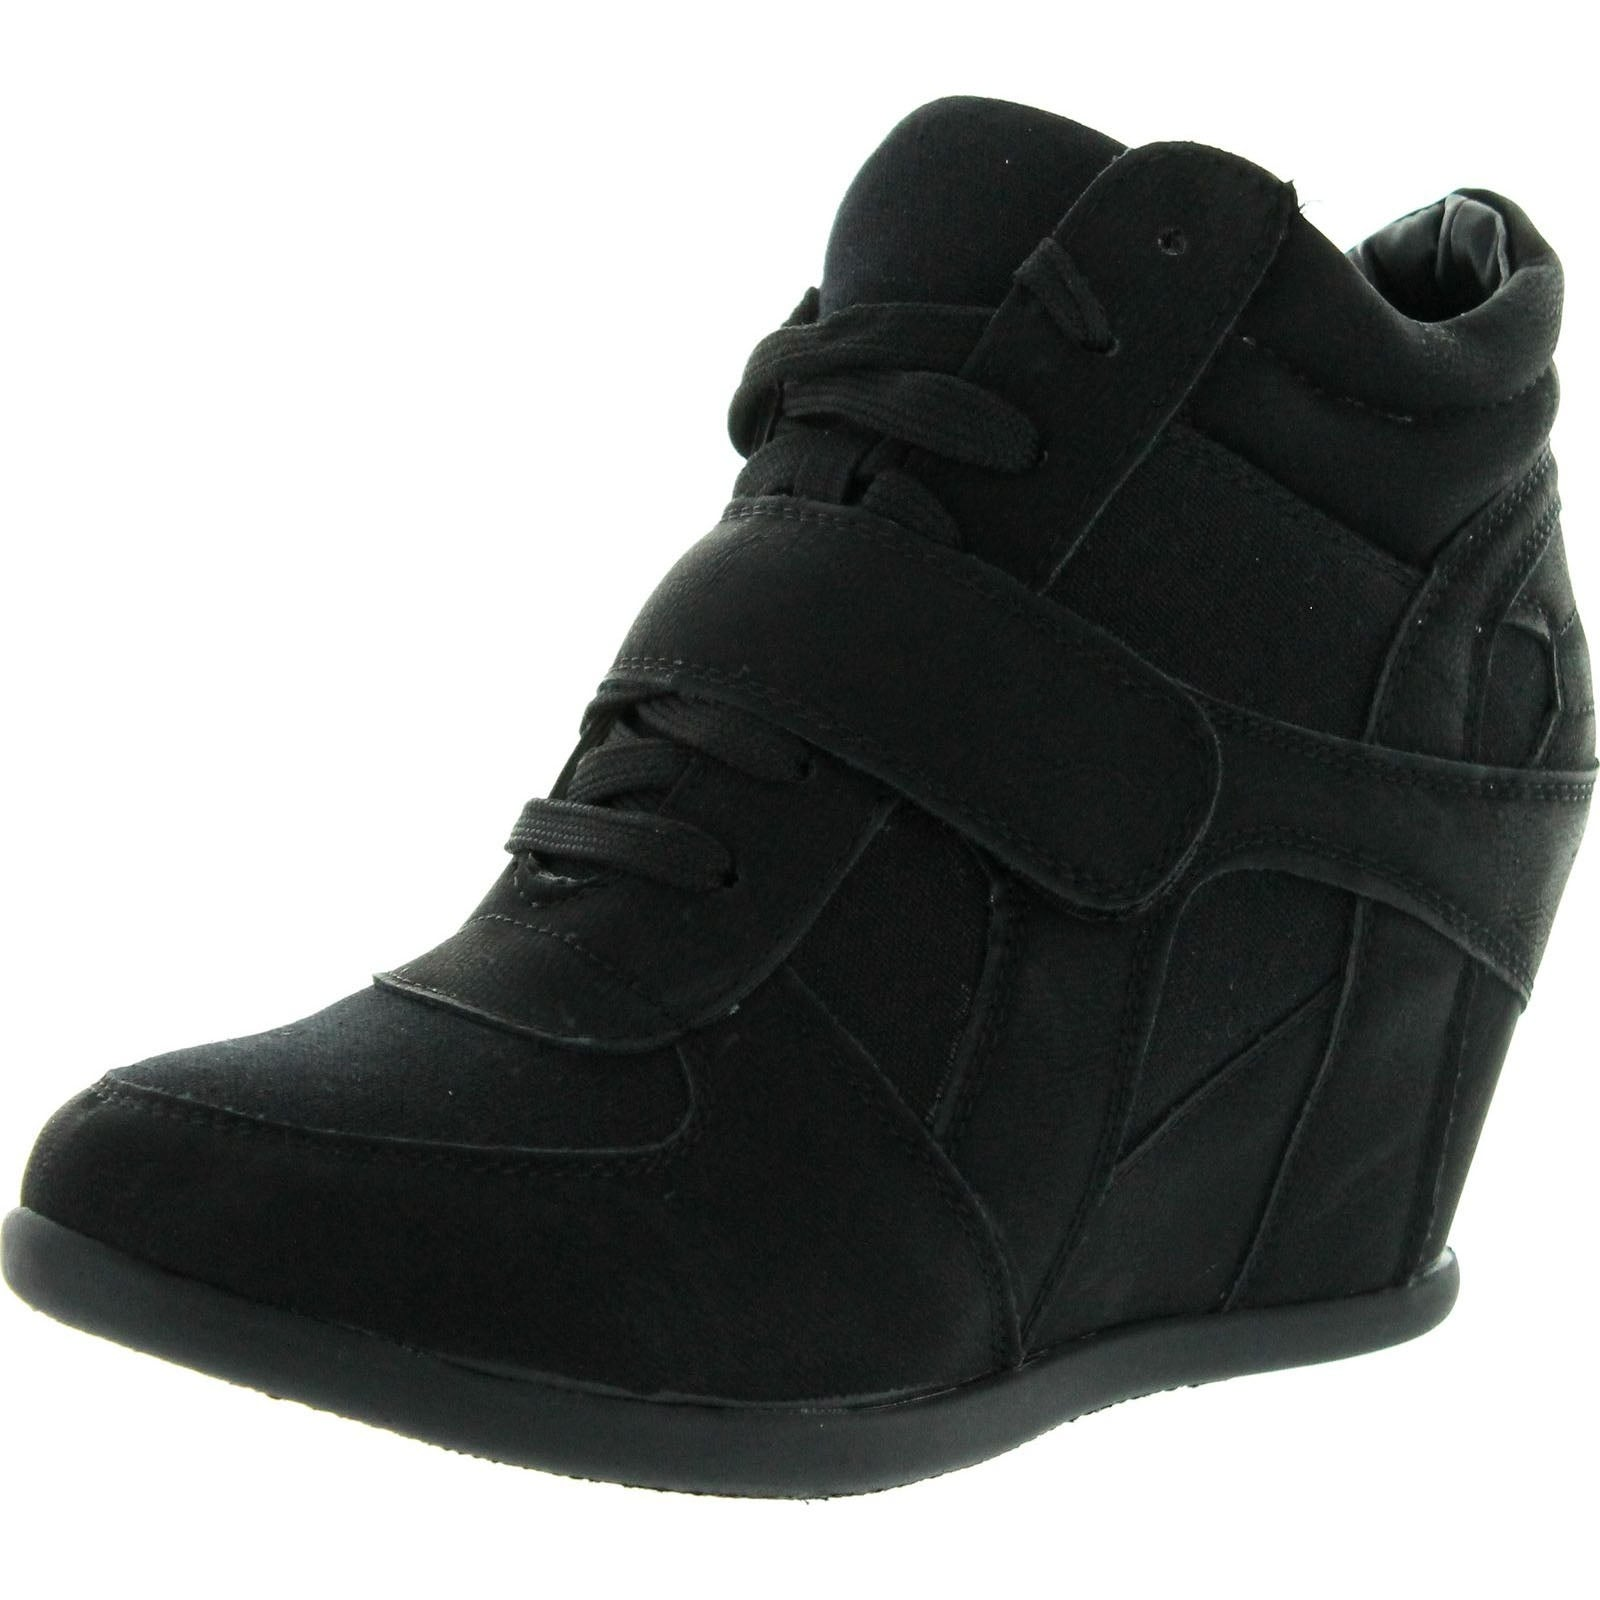 Strap Womens Hidden Wedge Sneaker Shoes